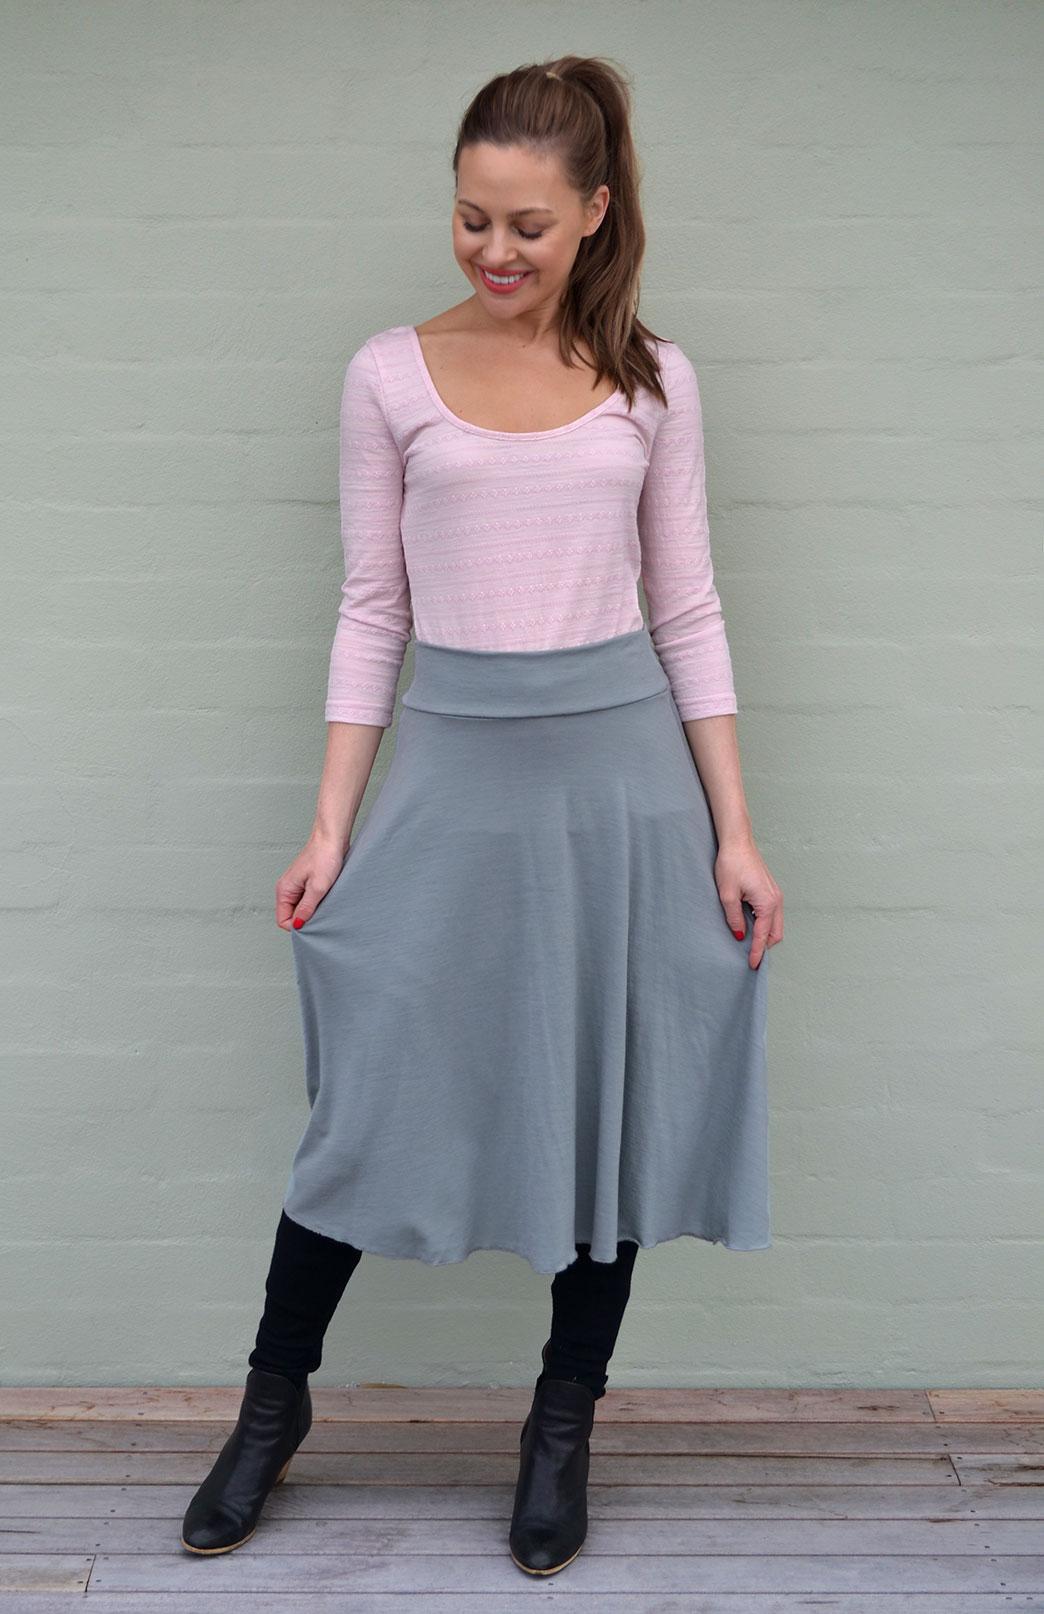 Twirl Skirt - Women's Grey Wool A-Line Twirl Skirt with elastic waistband - Smitten Merino Tasmania Australia